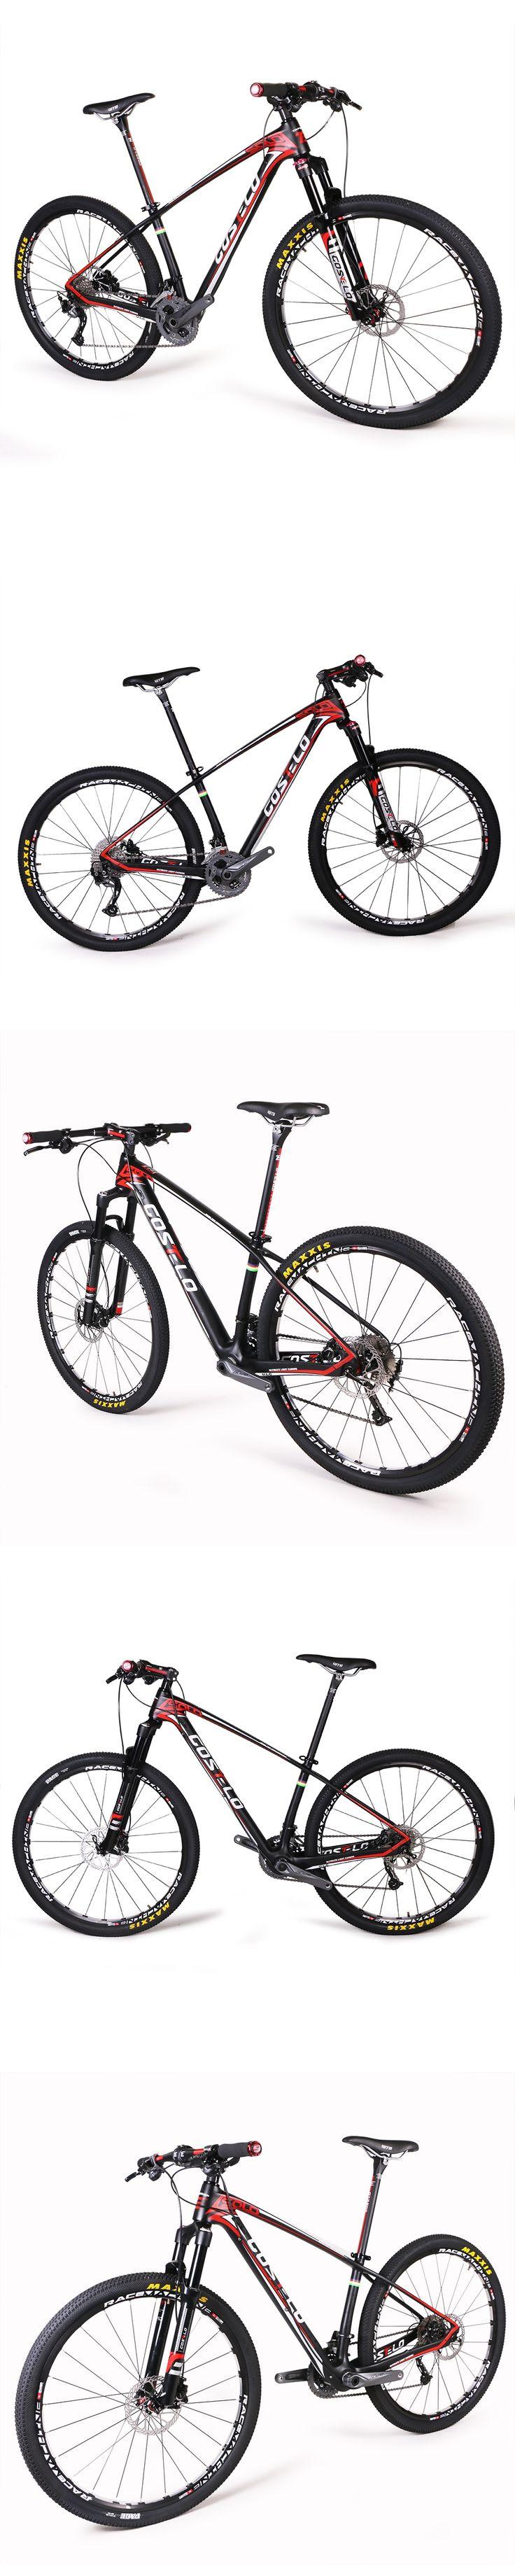 Original costelo 27.5 MTB Frame carbon Mountain Bike Ultralight 27.5er&29er MTB Frame original groups wheels saddle bar tire